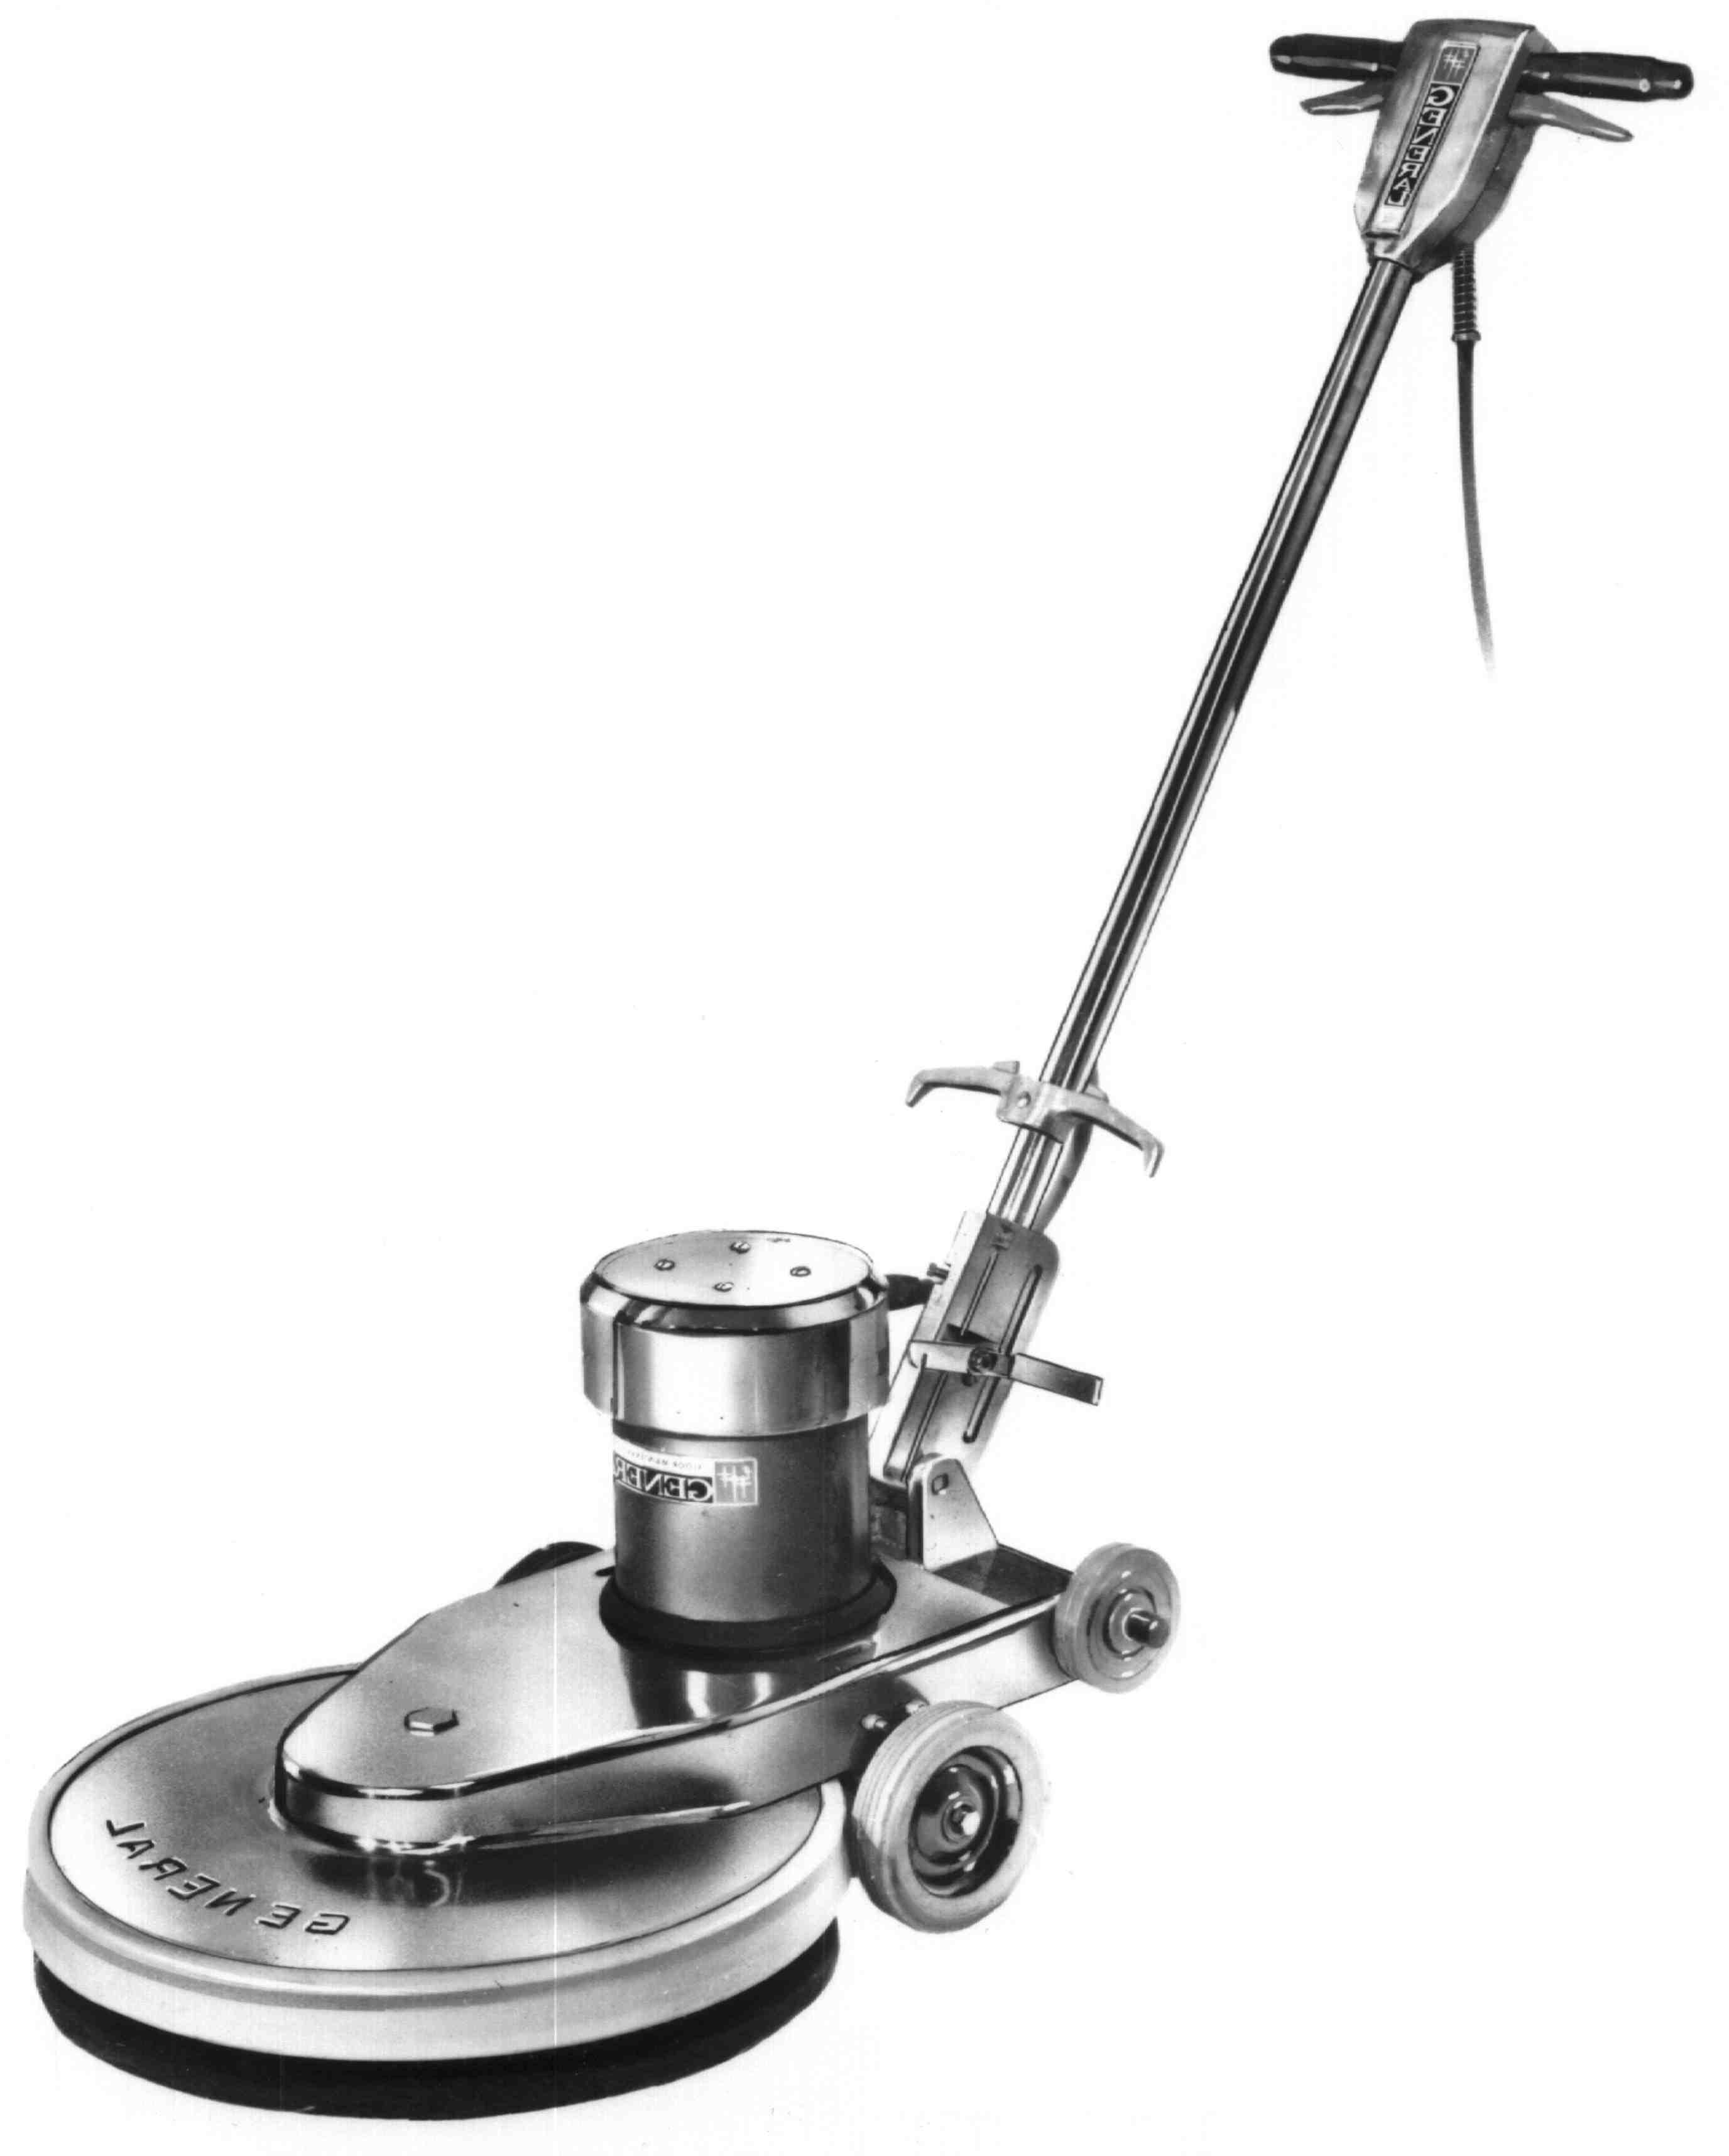 Floor Scrubber Clipart Clipart Suggest